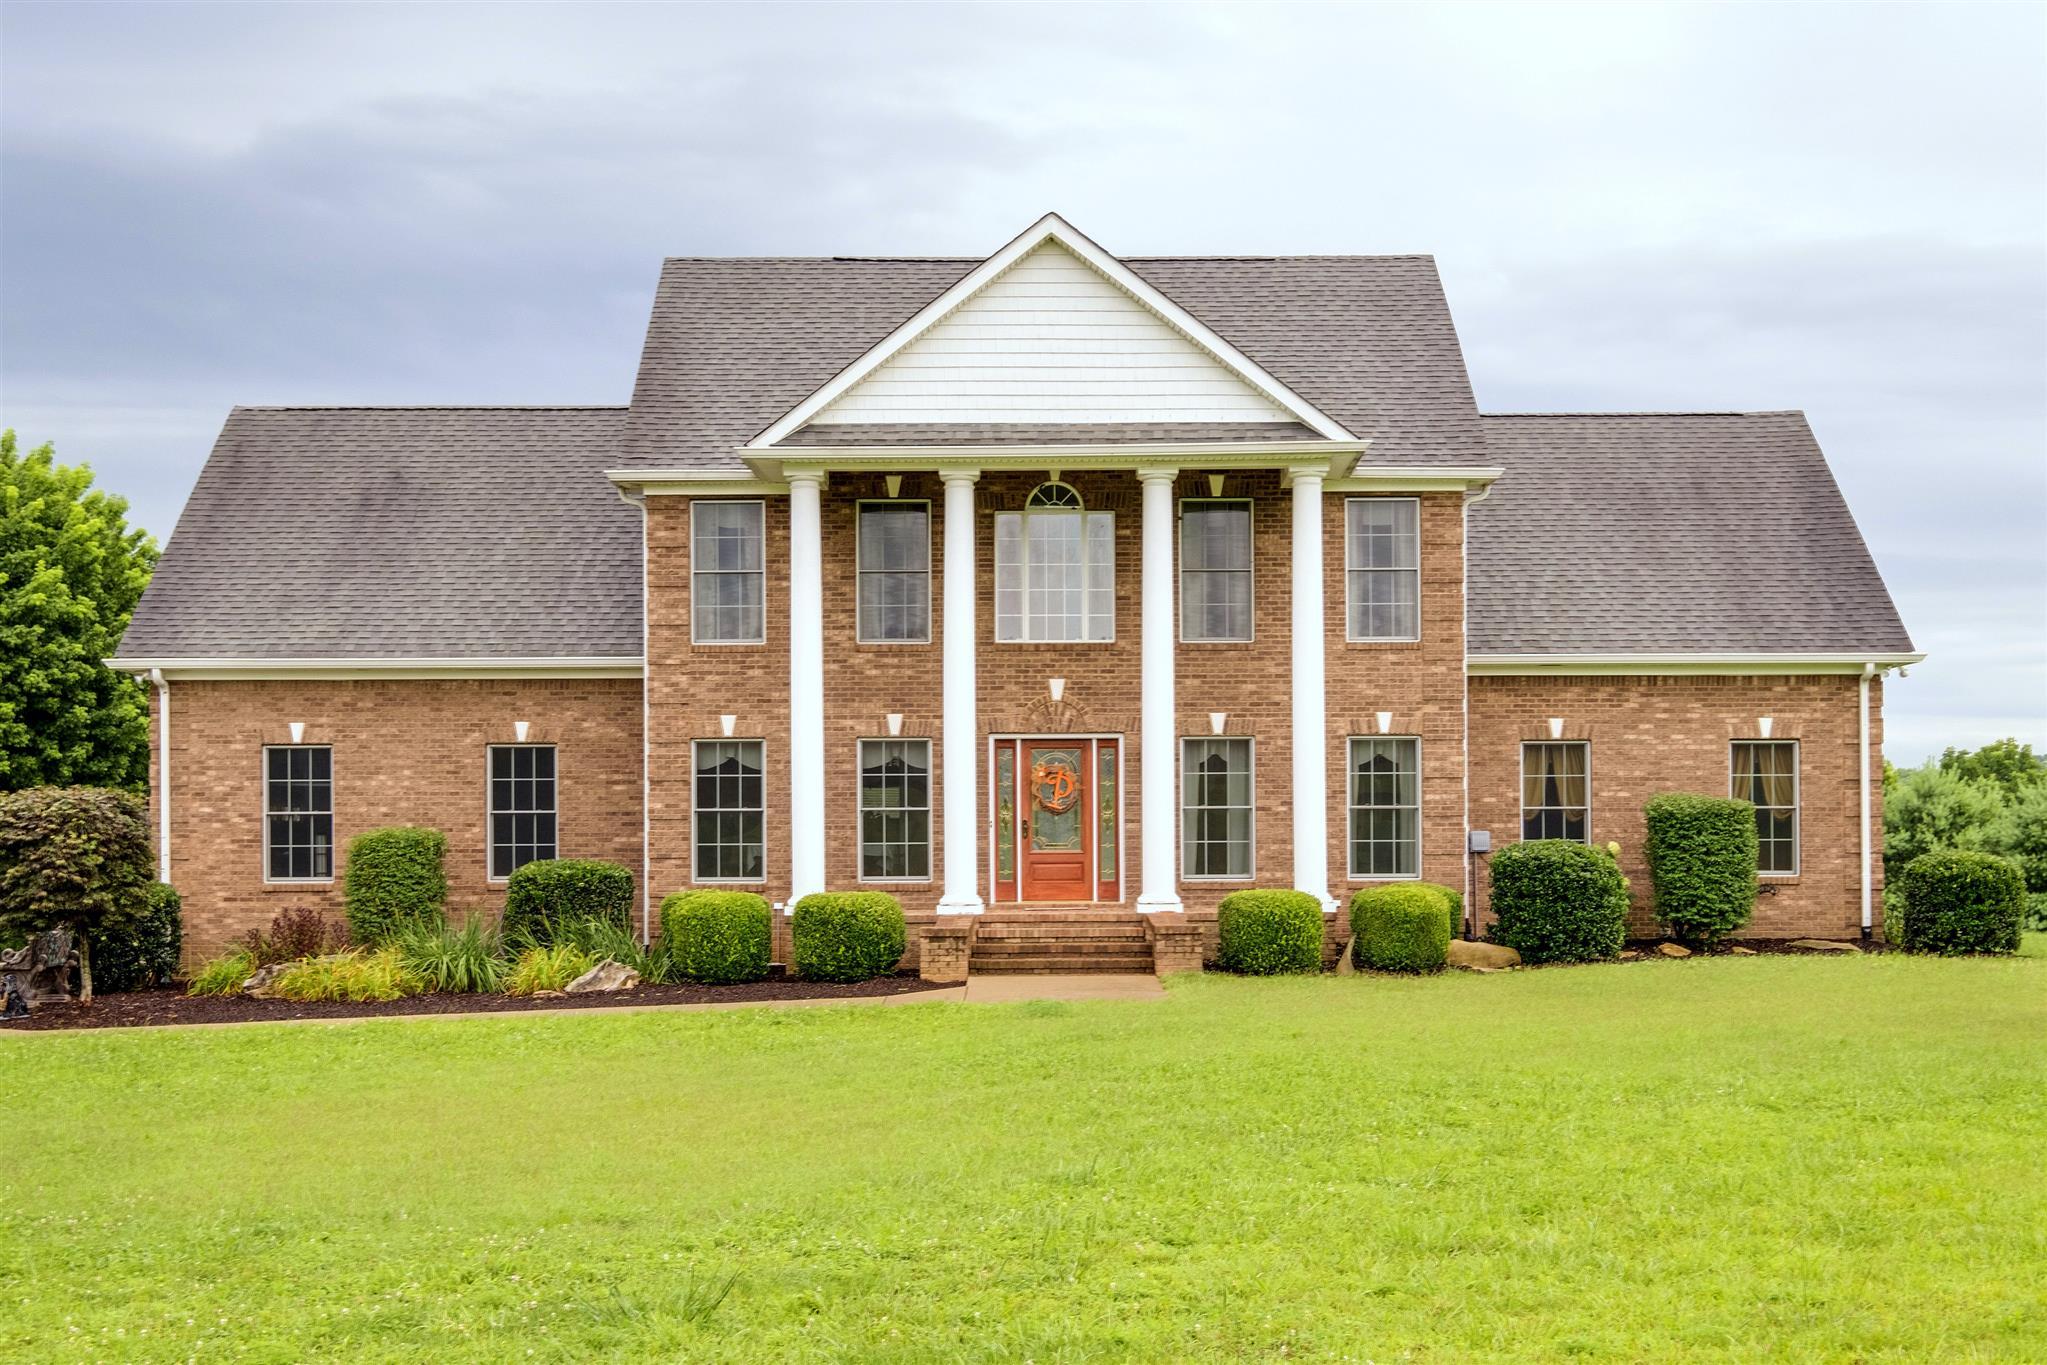 944 Cranford Hollow Ext Rd Columbia, TN 38401